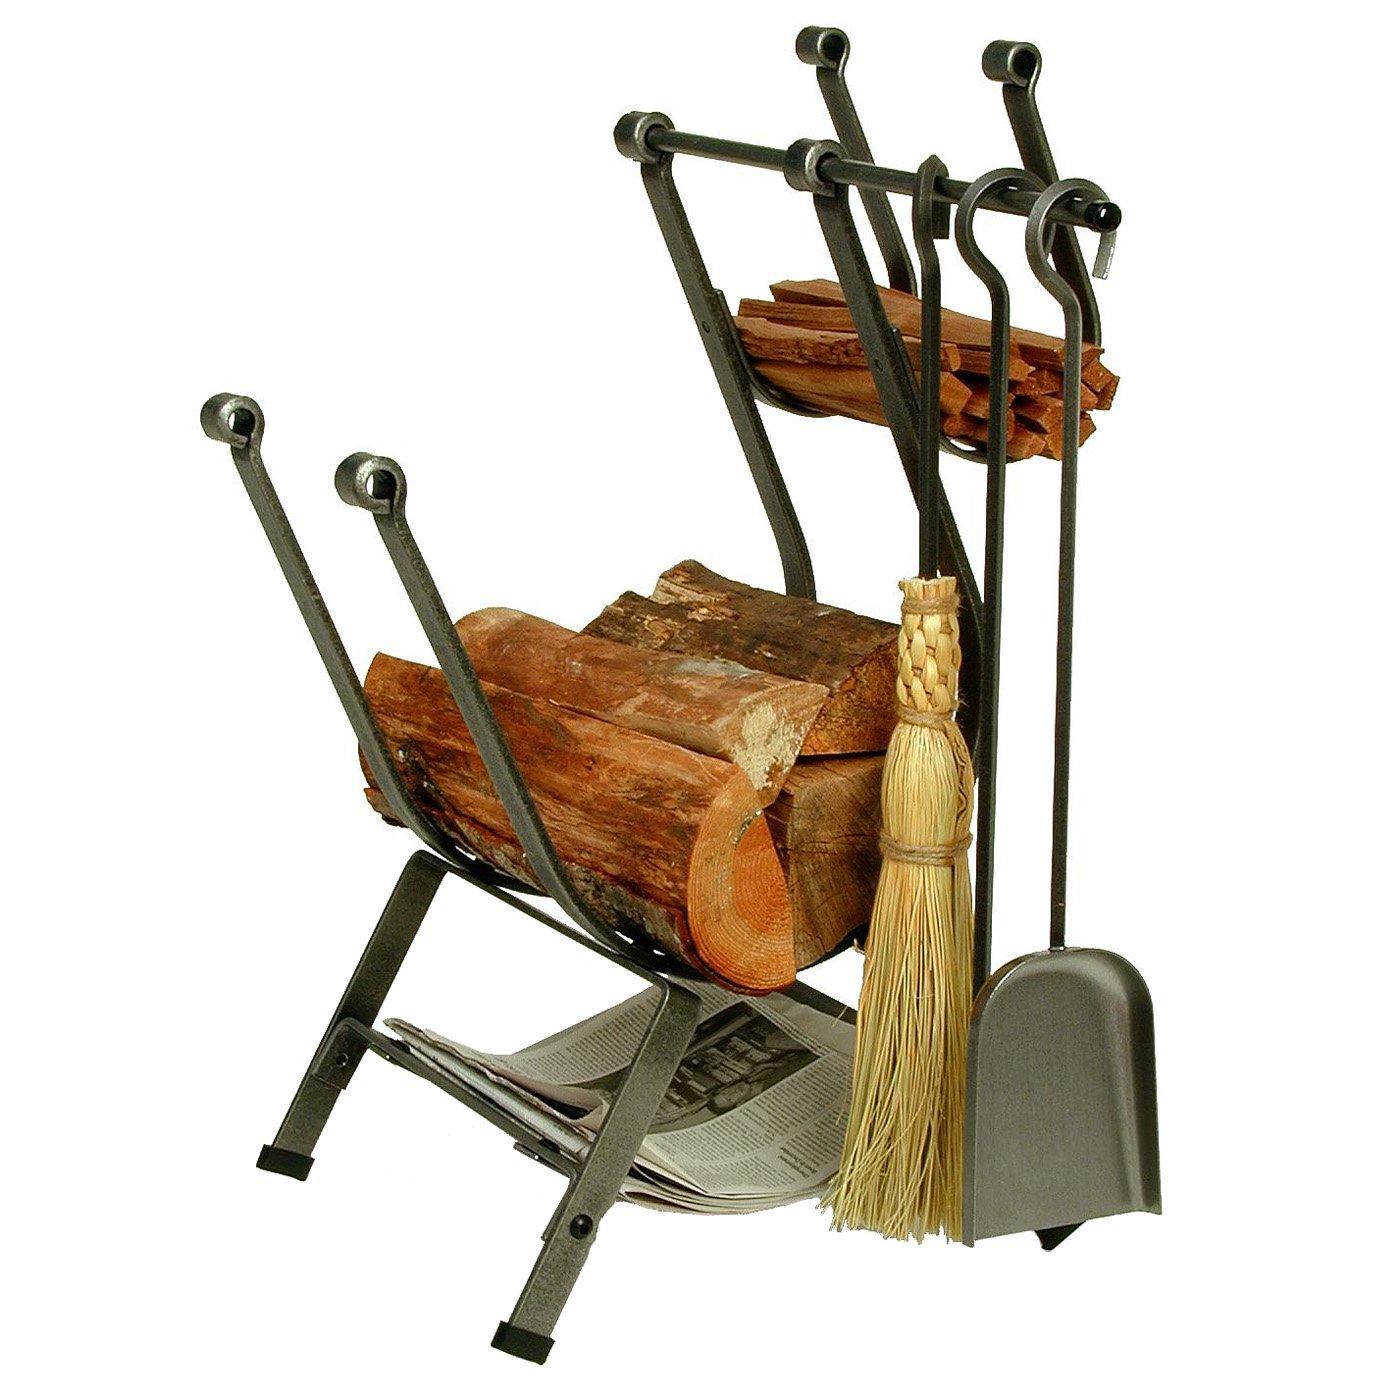 Enclume Design Front-loading Log Rack with Tools - Walmart.com